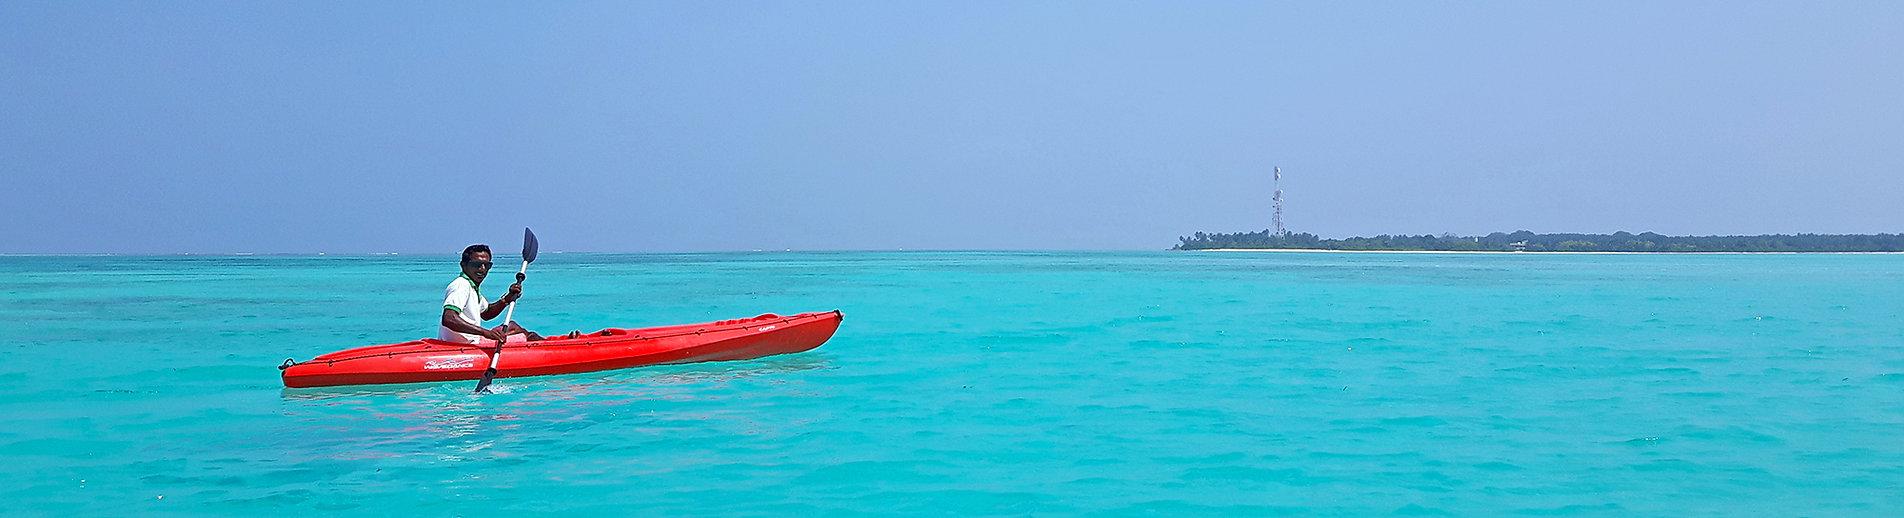 Transport, Fehendhoo, Goidhoo Atoll,